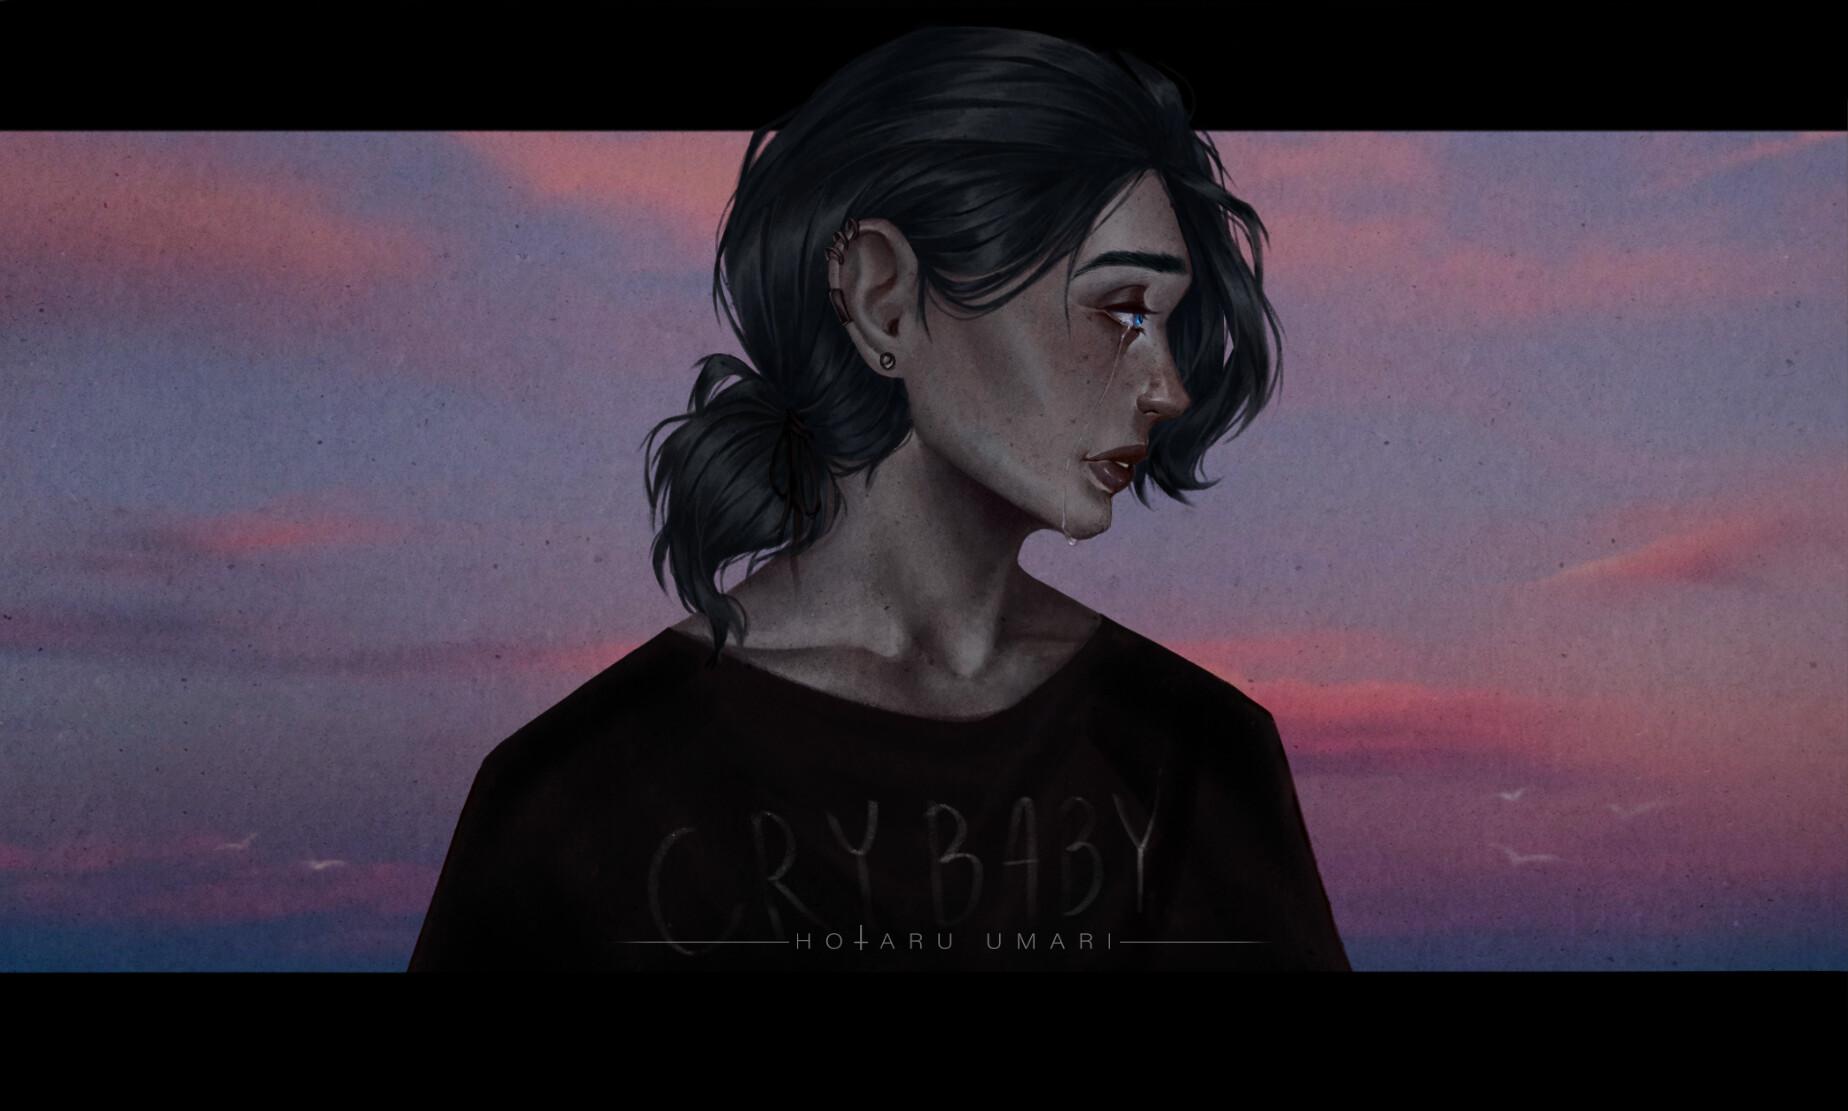 https://cdna.artstation.com/p/assets/images/images/032/276/290/large/hotaru-umari-crybaby.jpg?1605968453